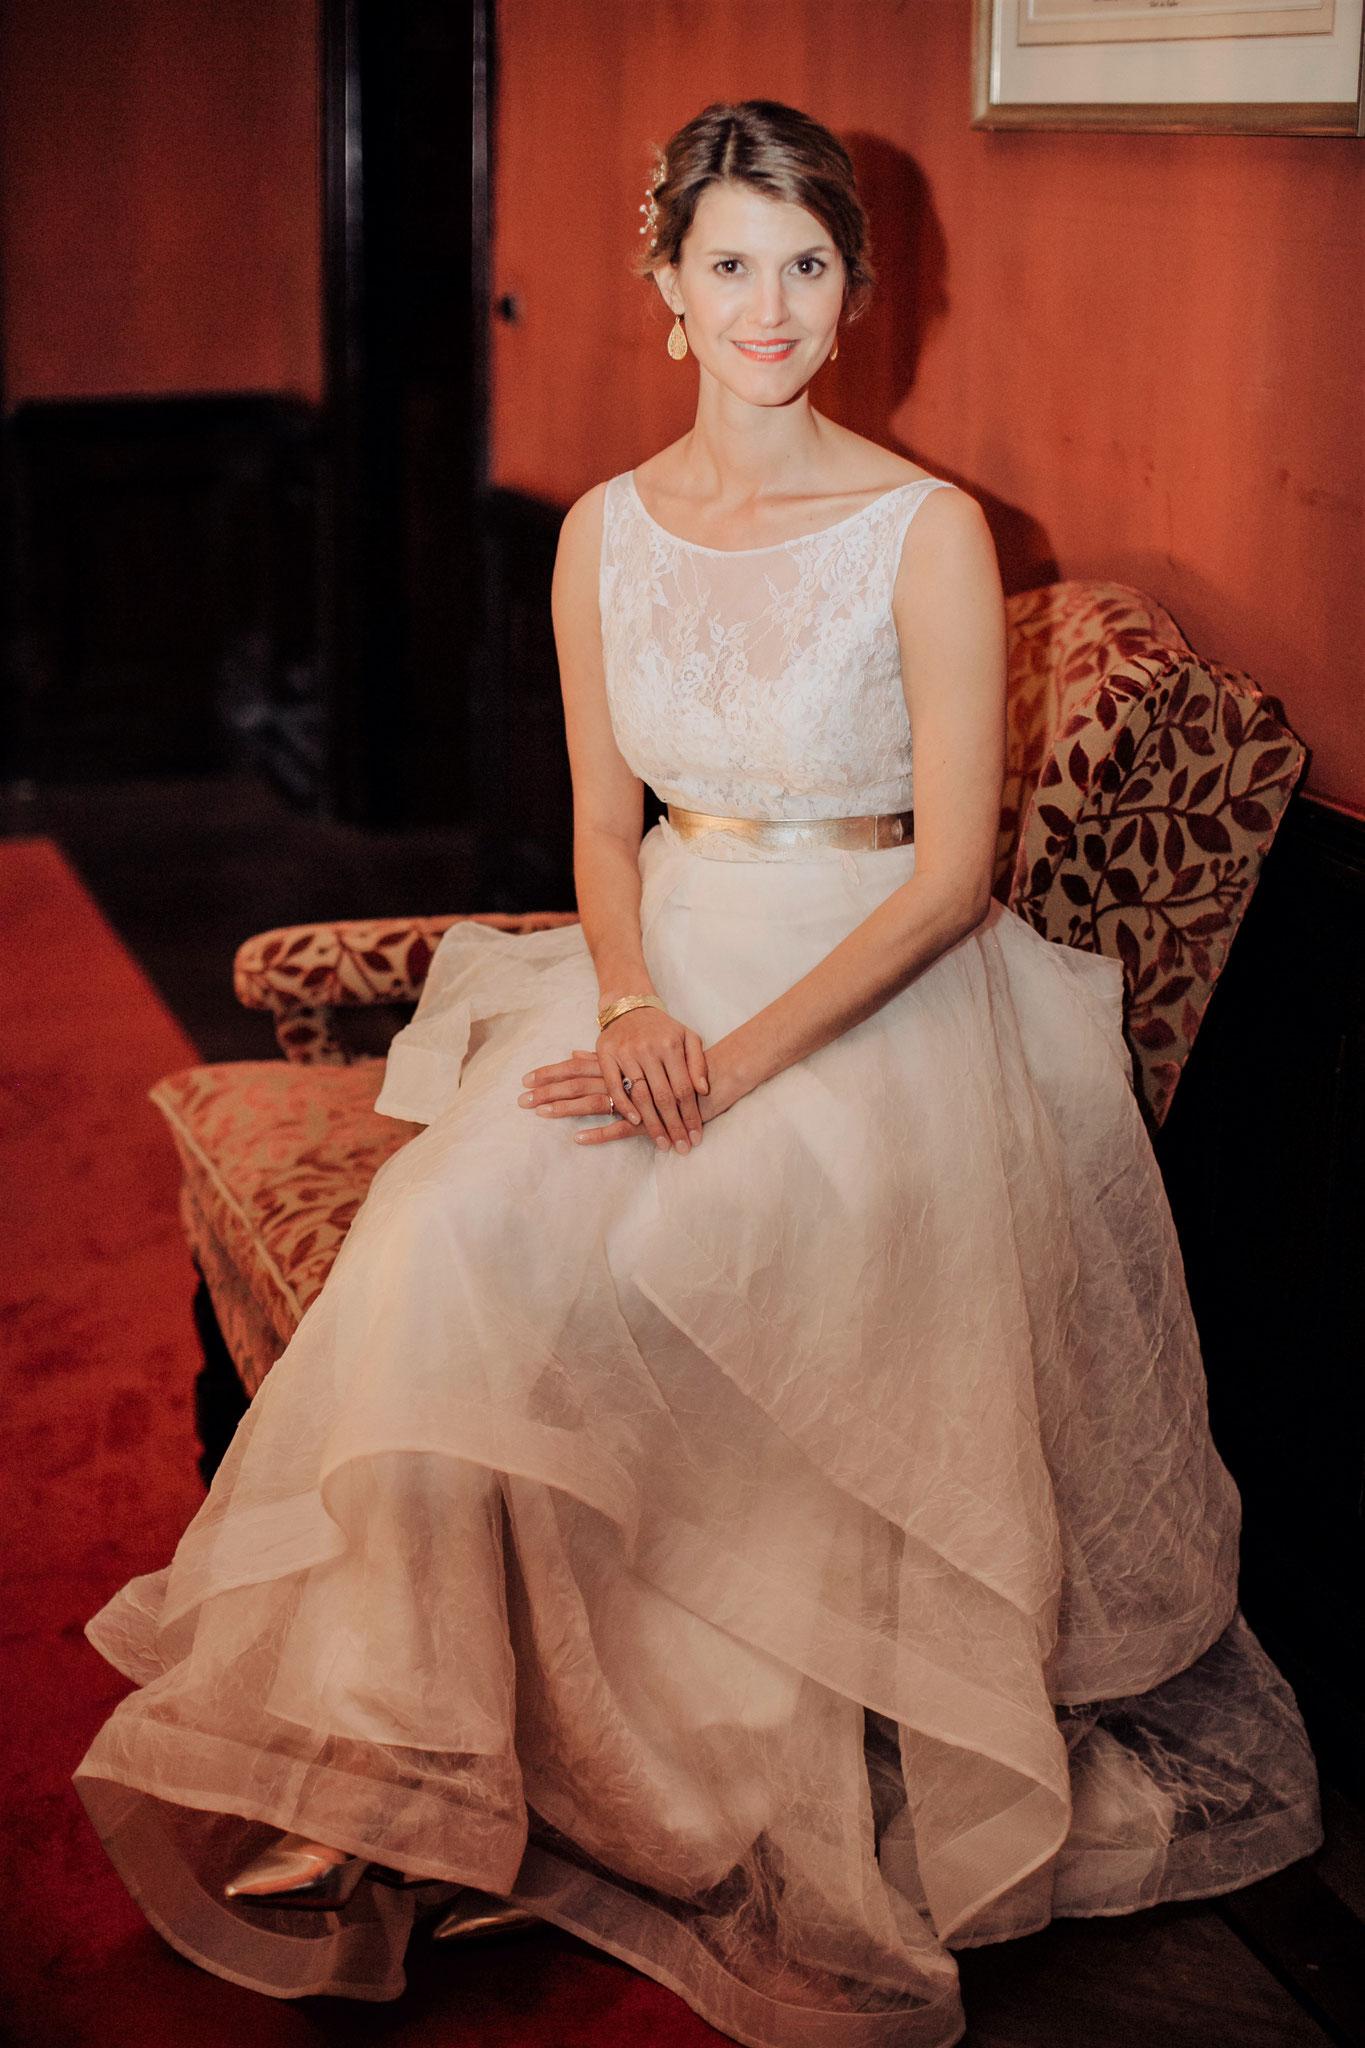 Real Bride in der Hotel Lobby